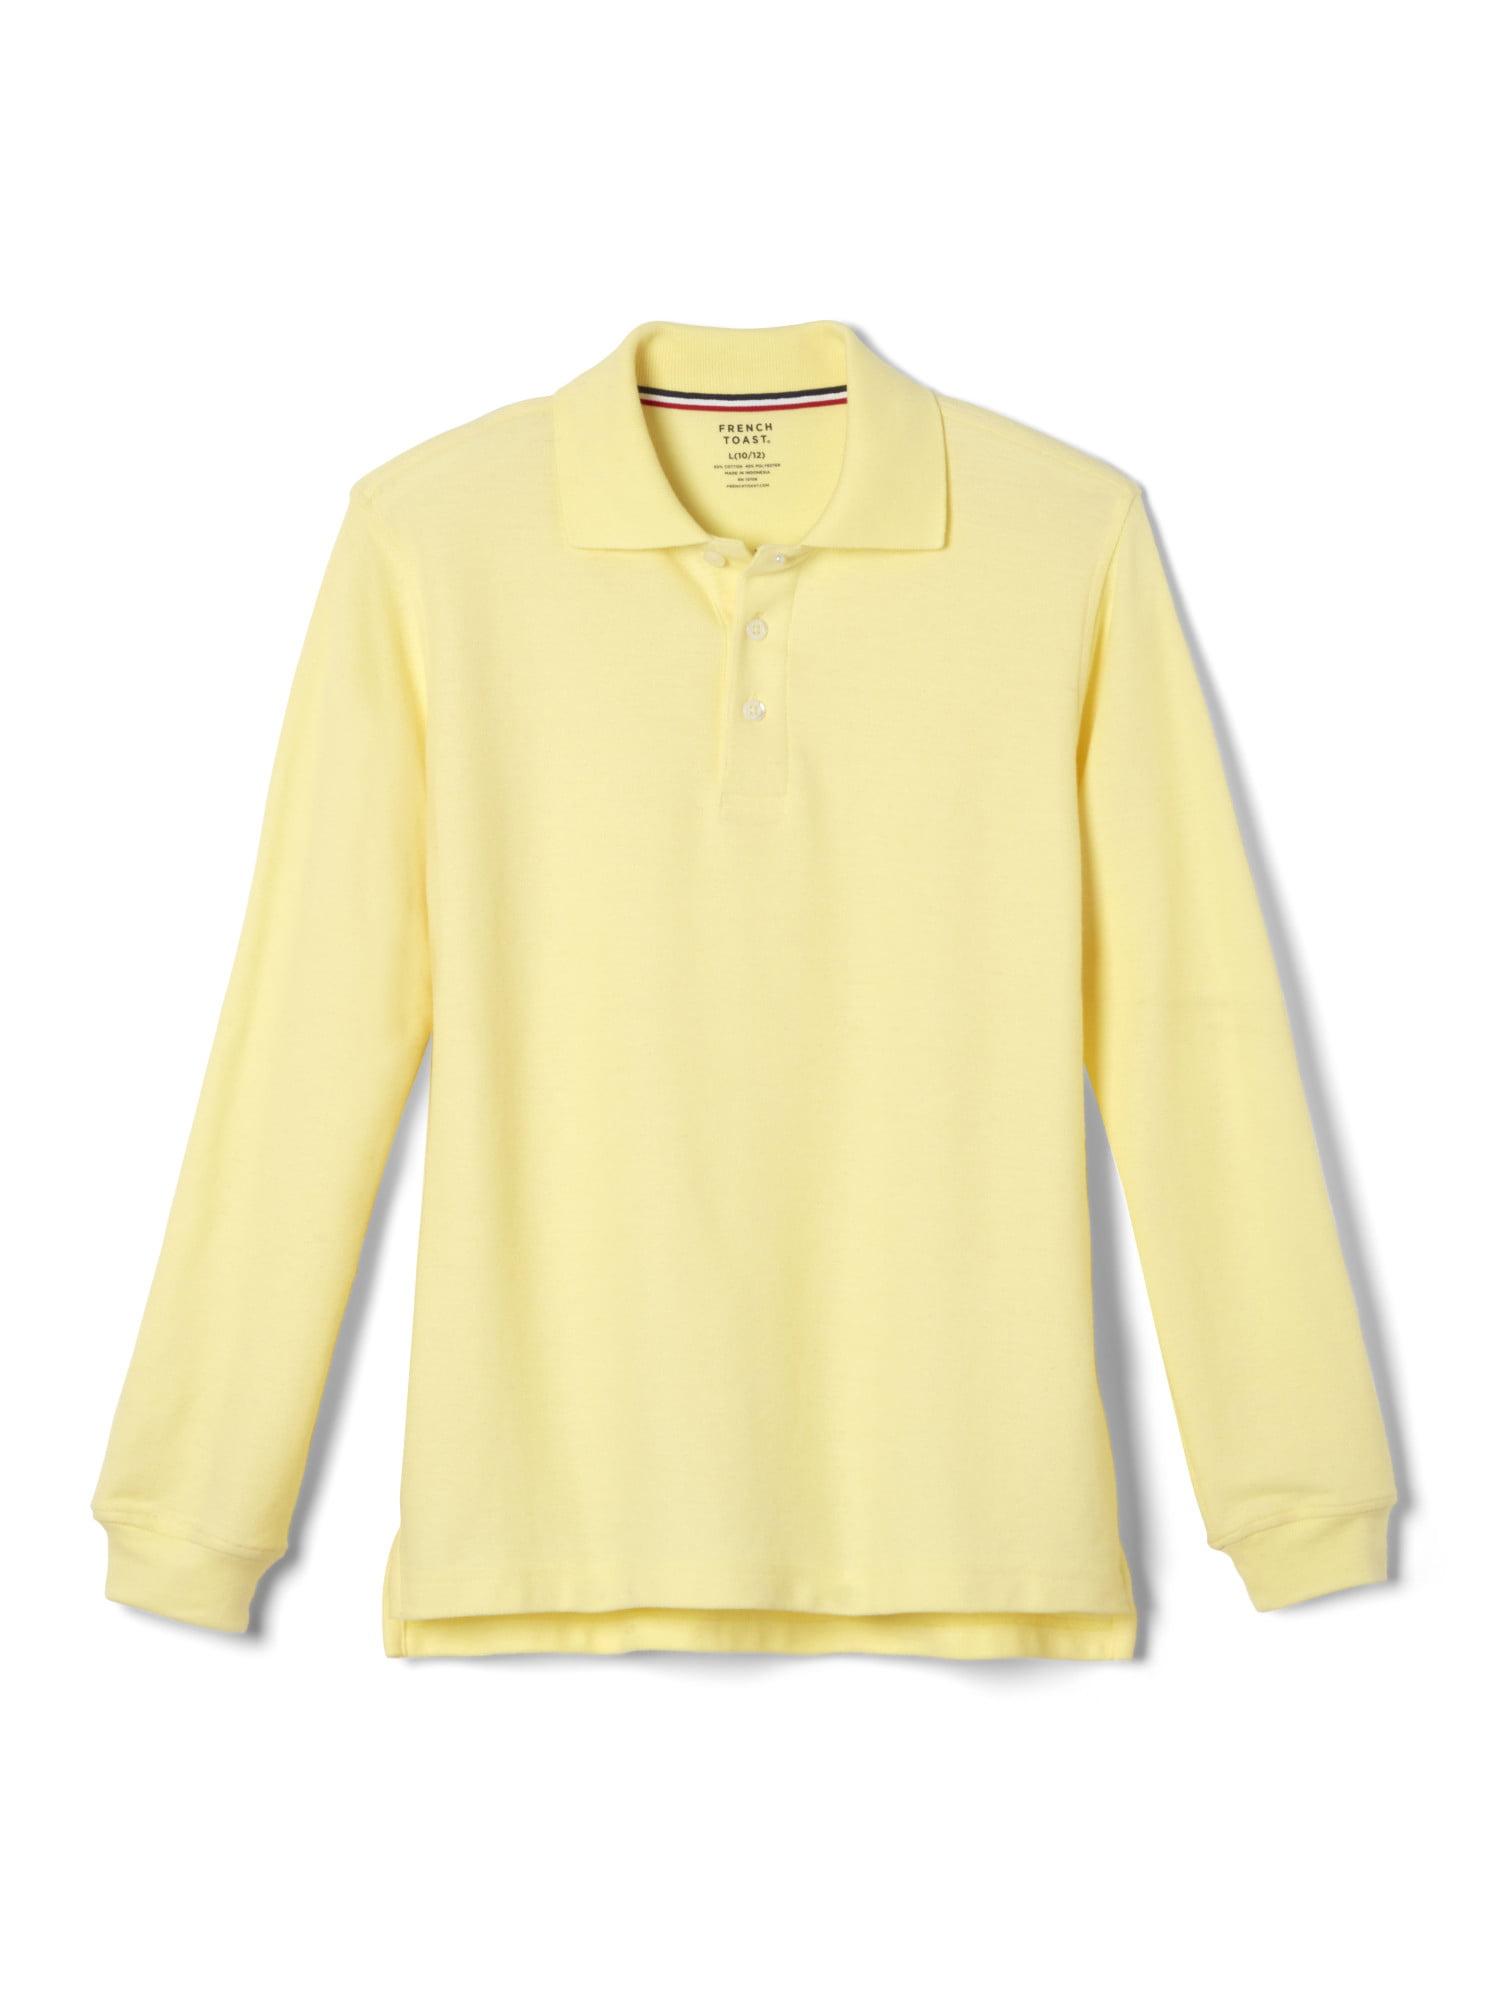 French Toast  Boys Long Sleeve Pique Polo Shirt Light Blue 8,Big Boys